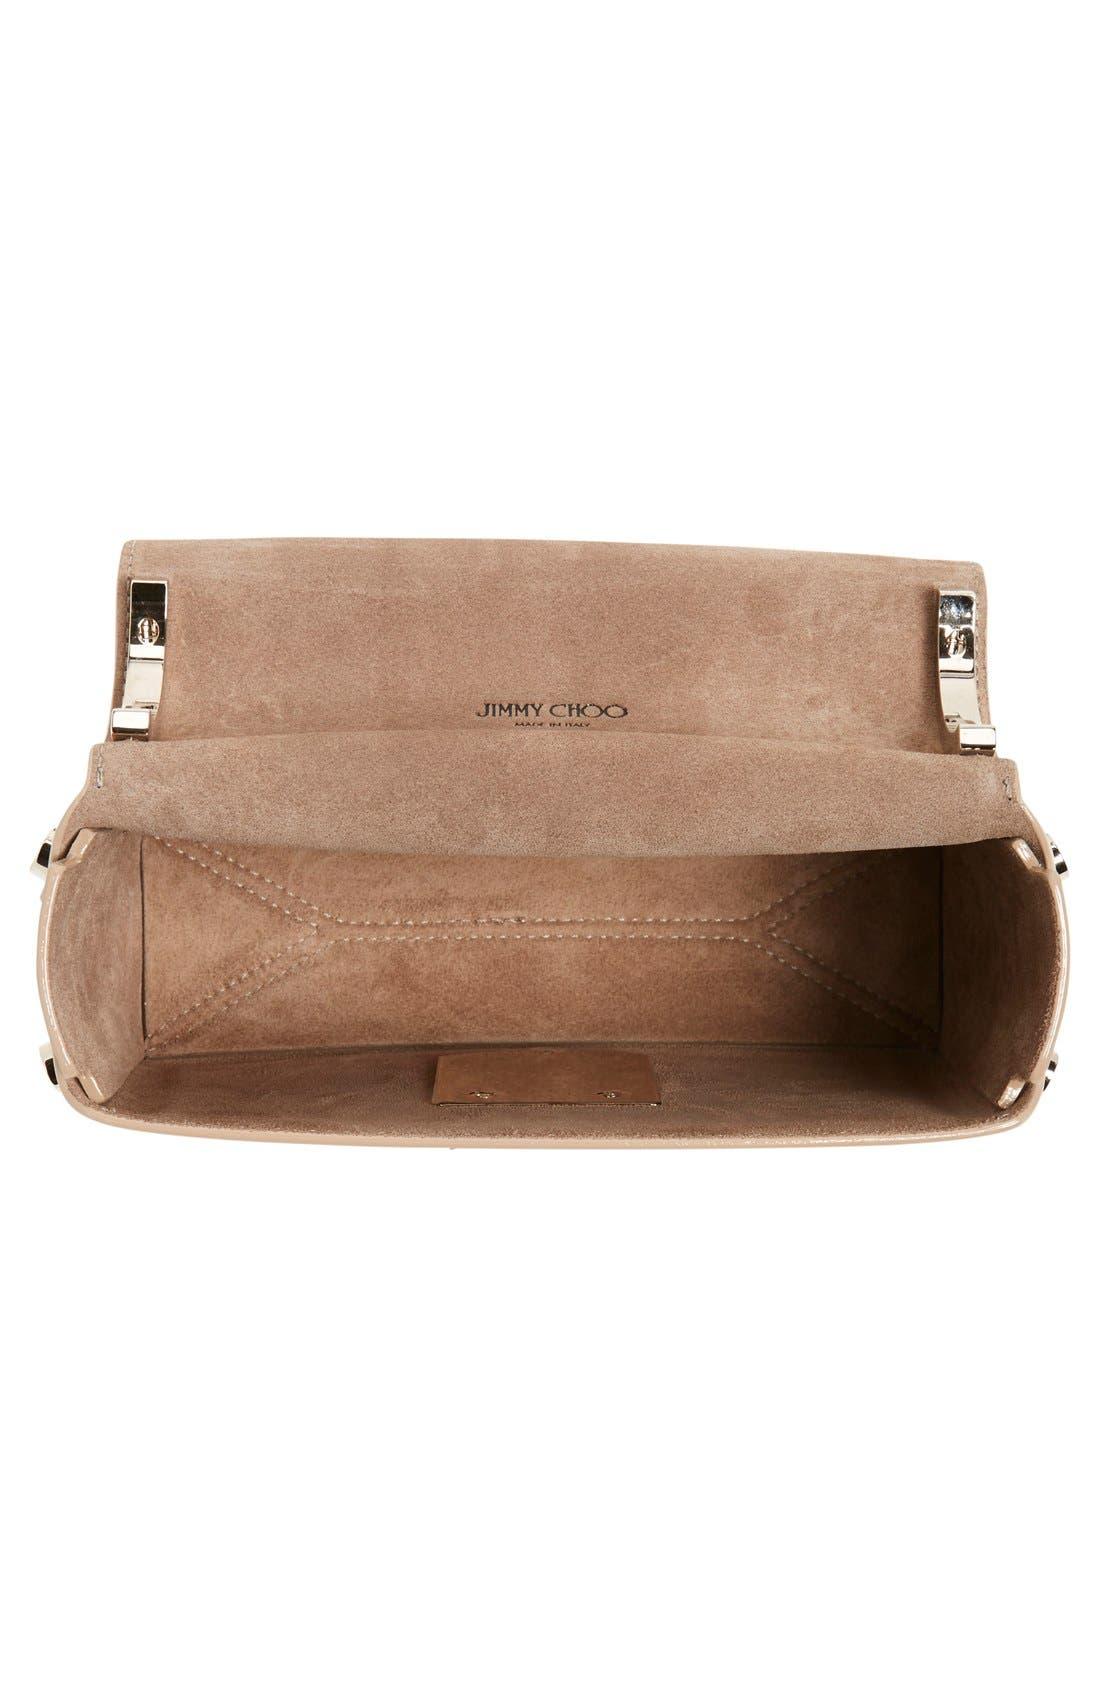 'Lockett Petite' Metallic Leather Shoulder Bag,                             Alternate thumbnail 8, color,